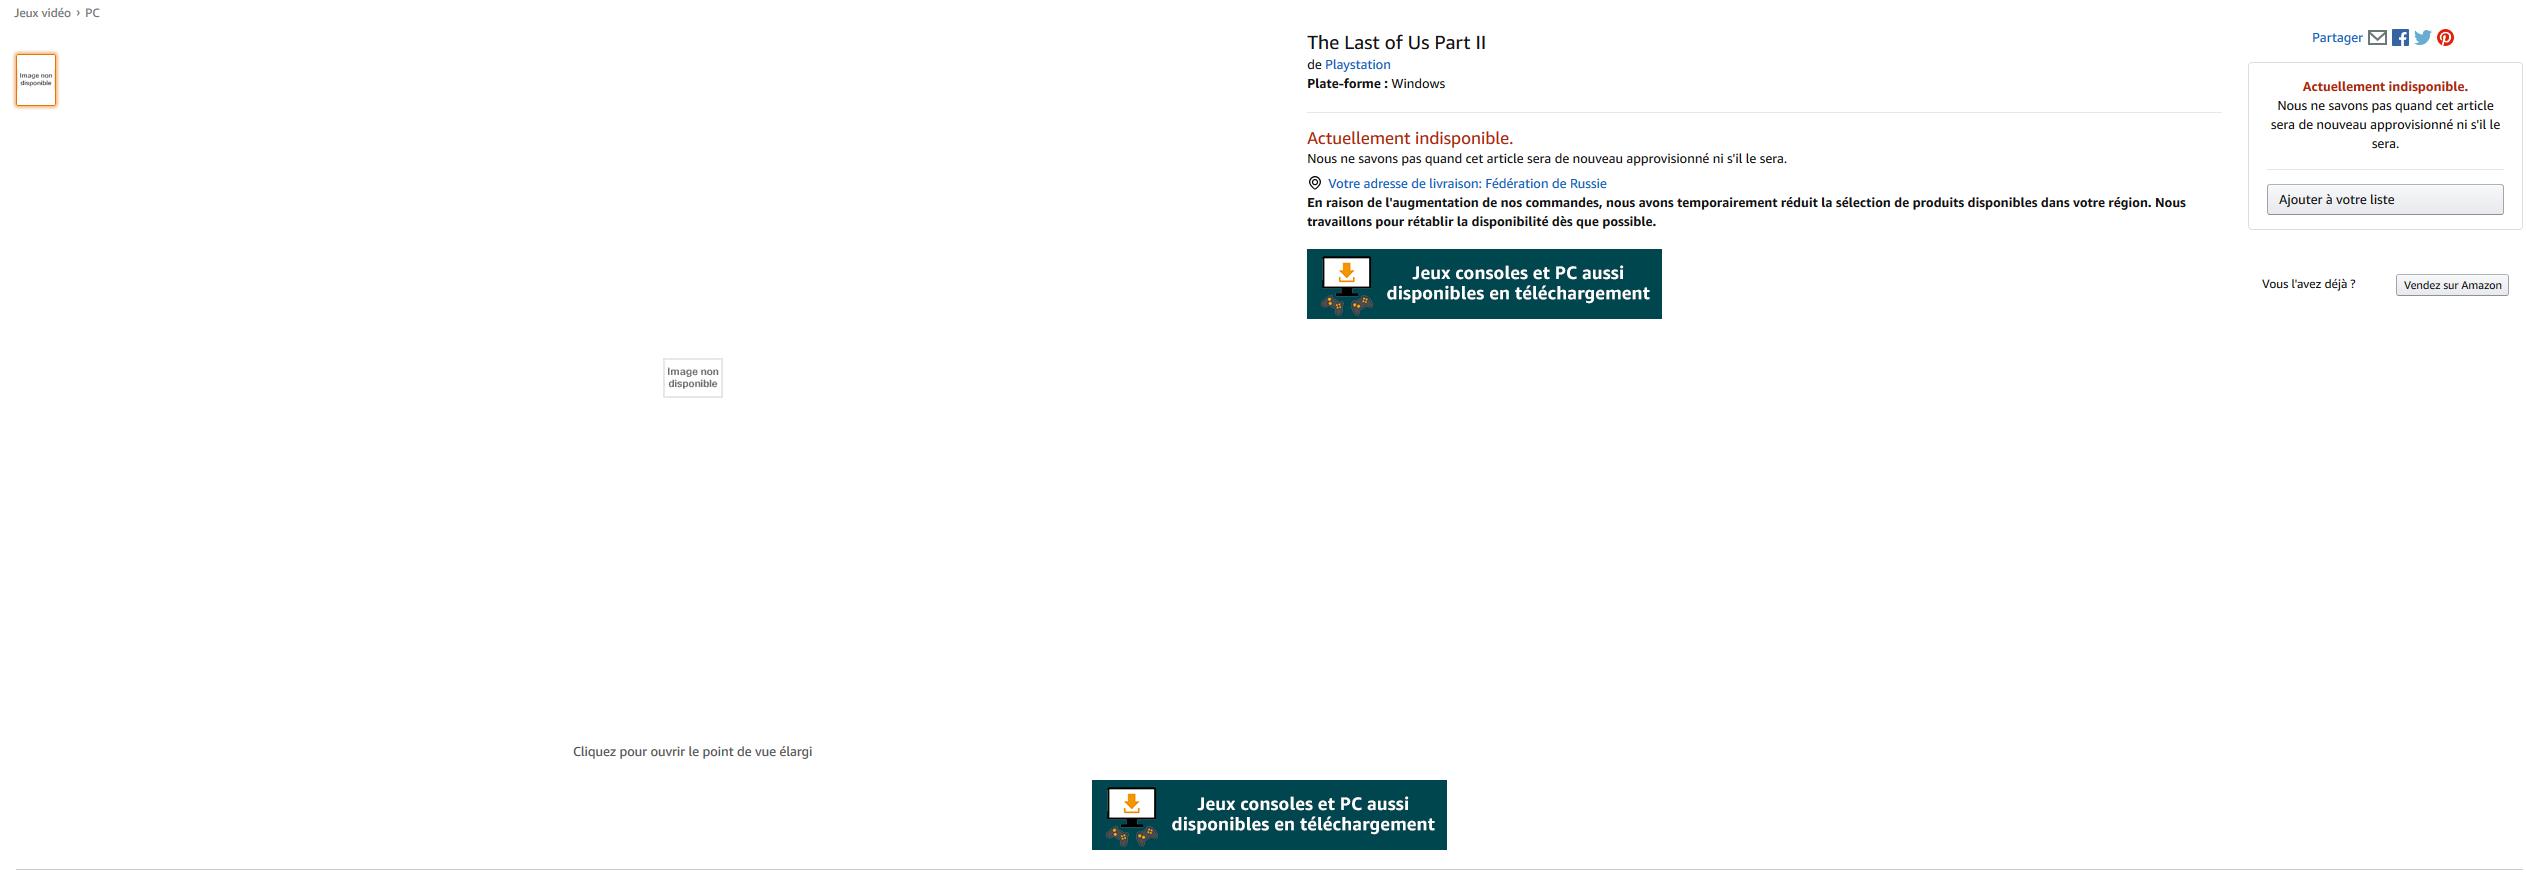 На Amazon появились страницы PC-версий Person 5 Royal, Days Gone и Gran Turismo Sport